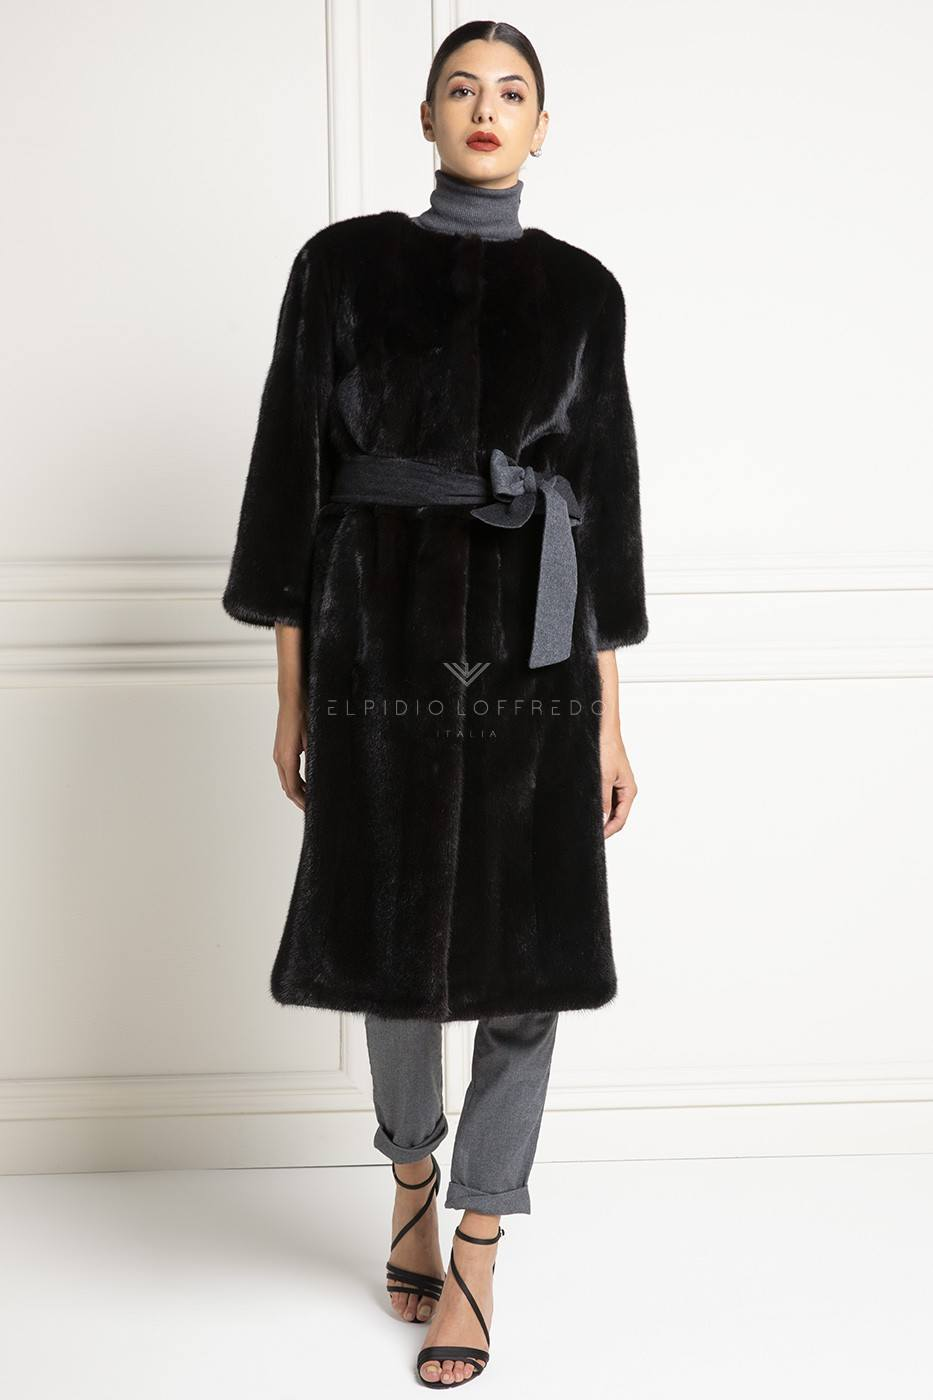 Blackglama Mink Coat with Plat Collar - Length 105 cm